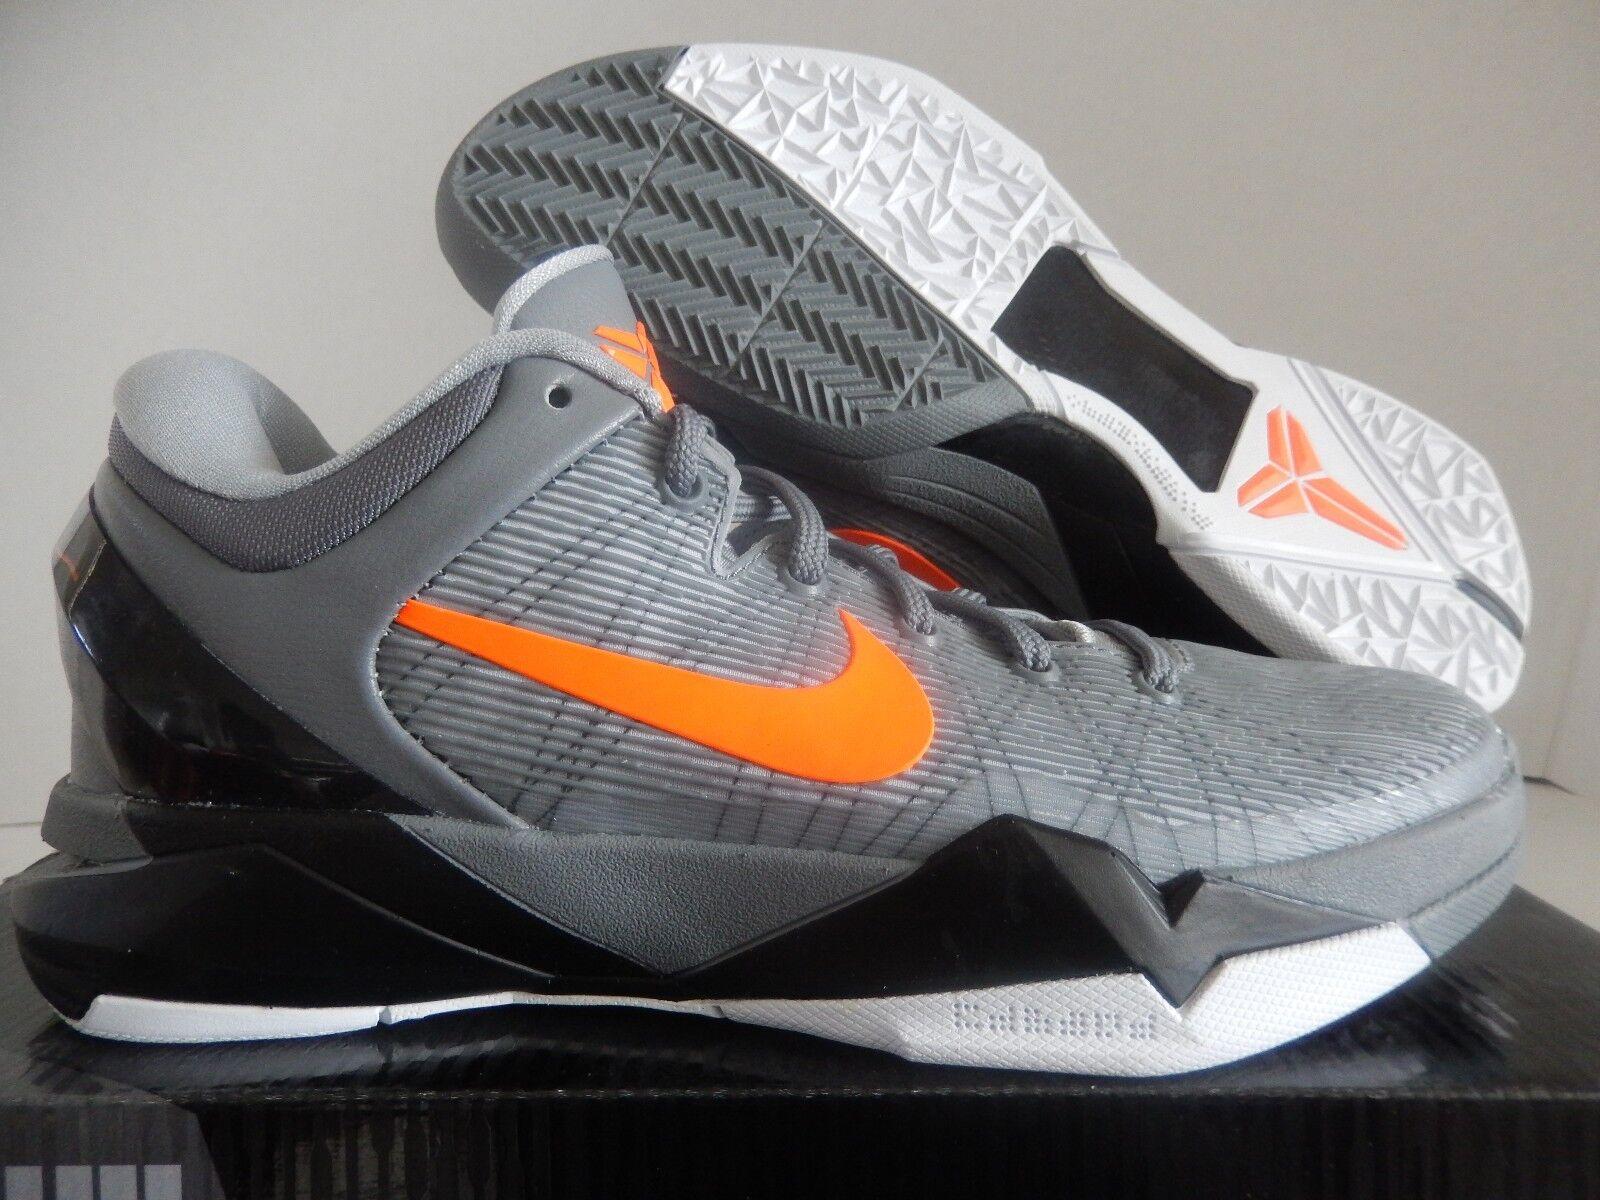 00e35521f32 Nike Zoom Kobe VII 7 System